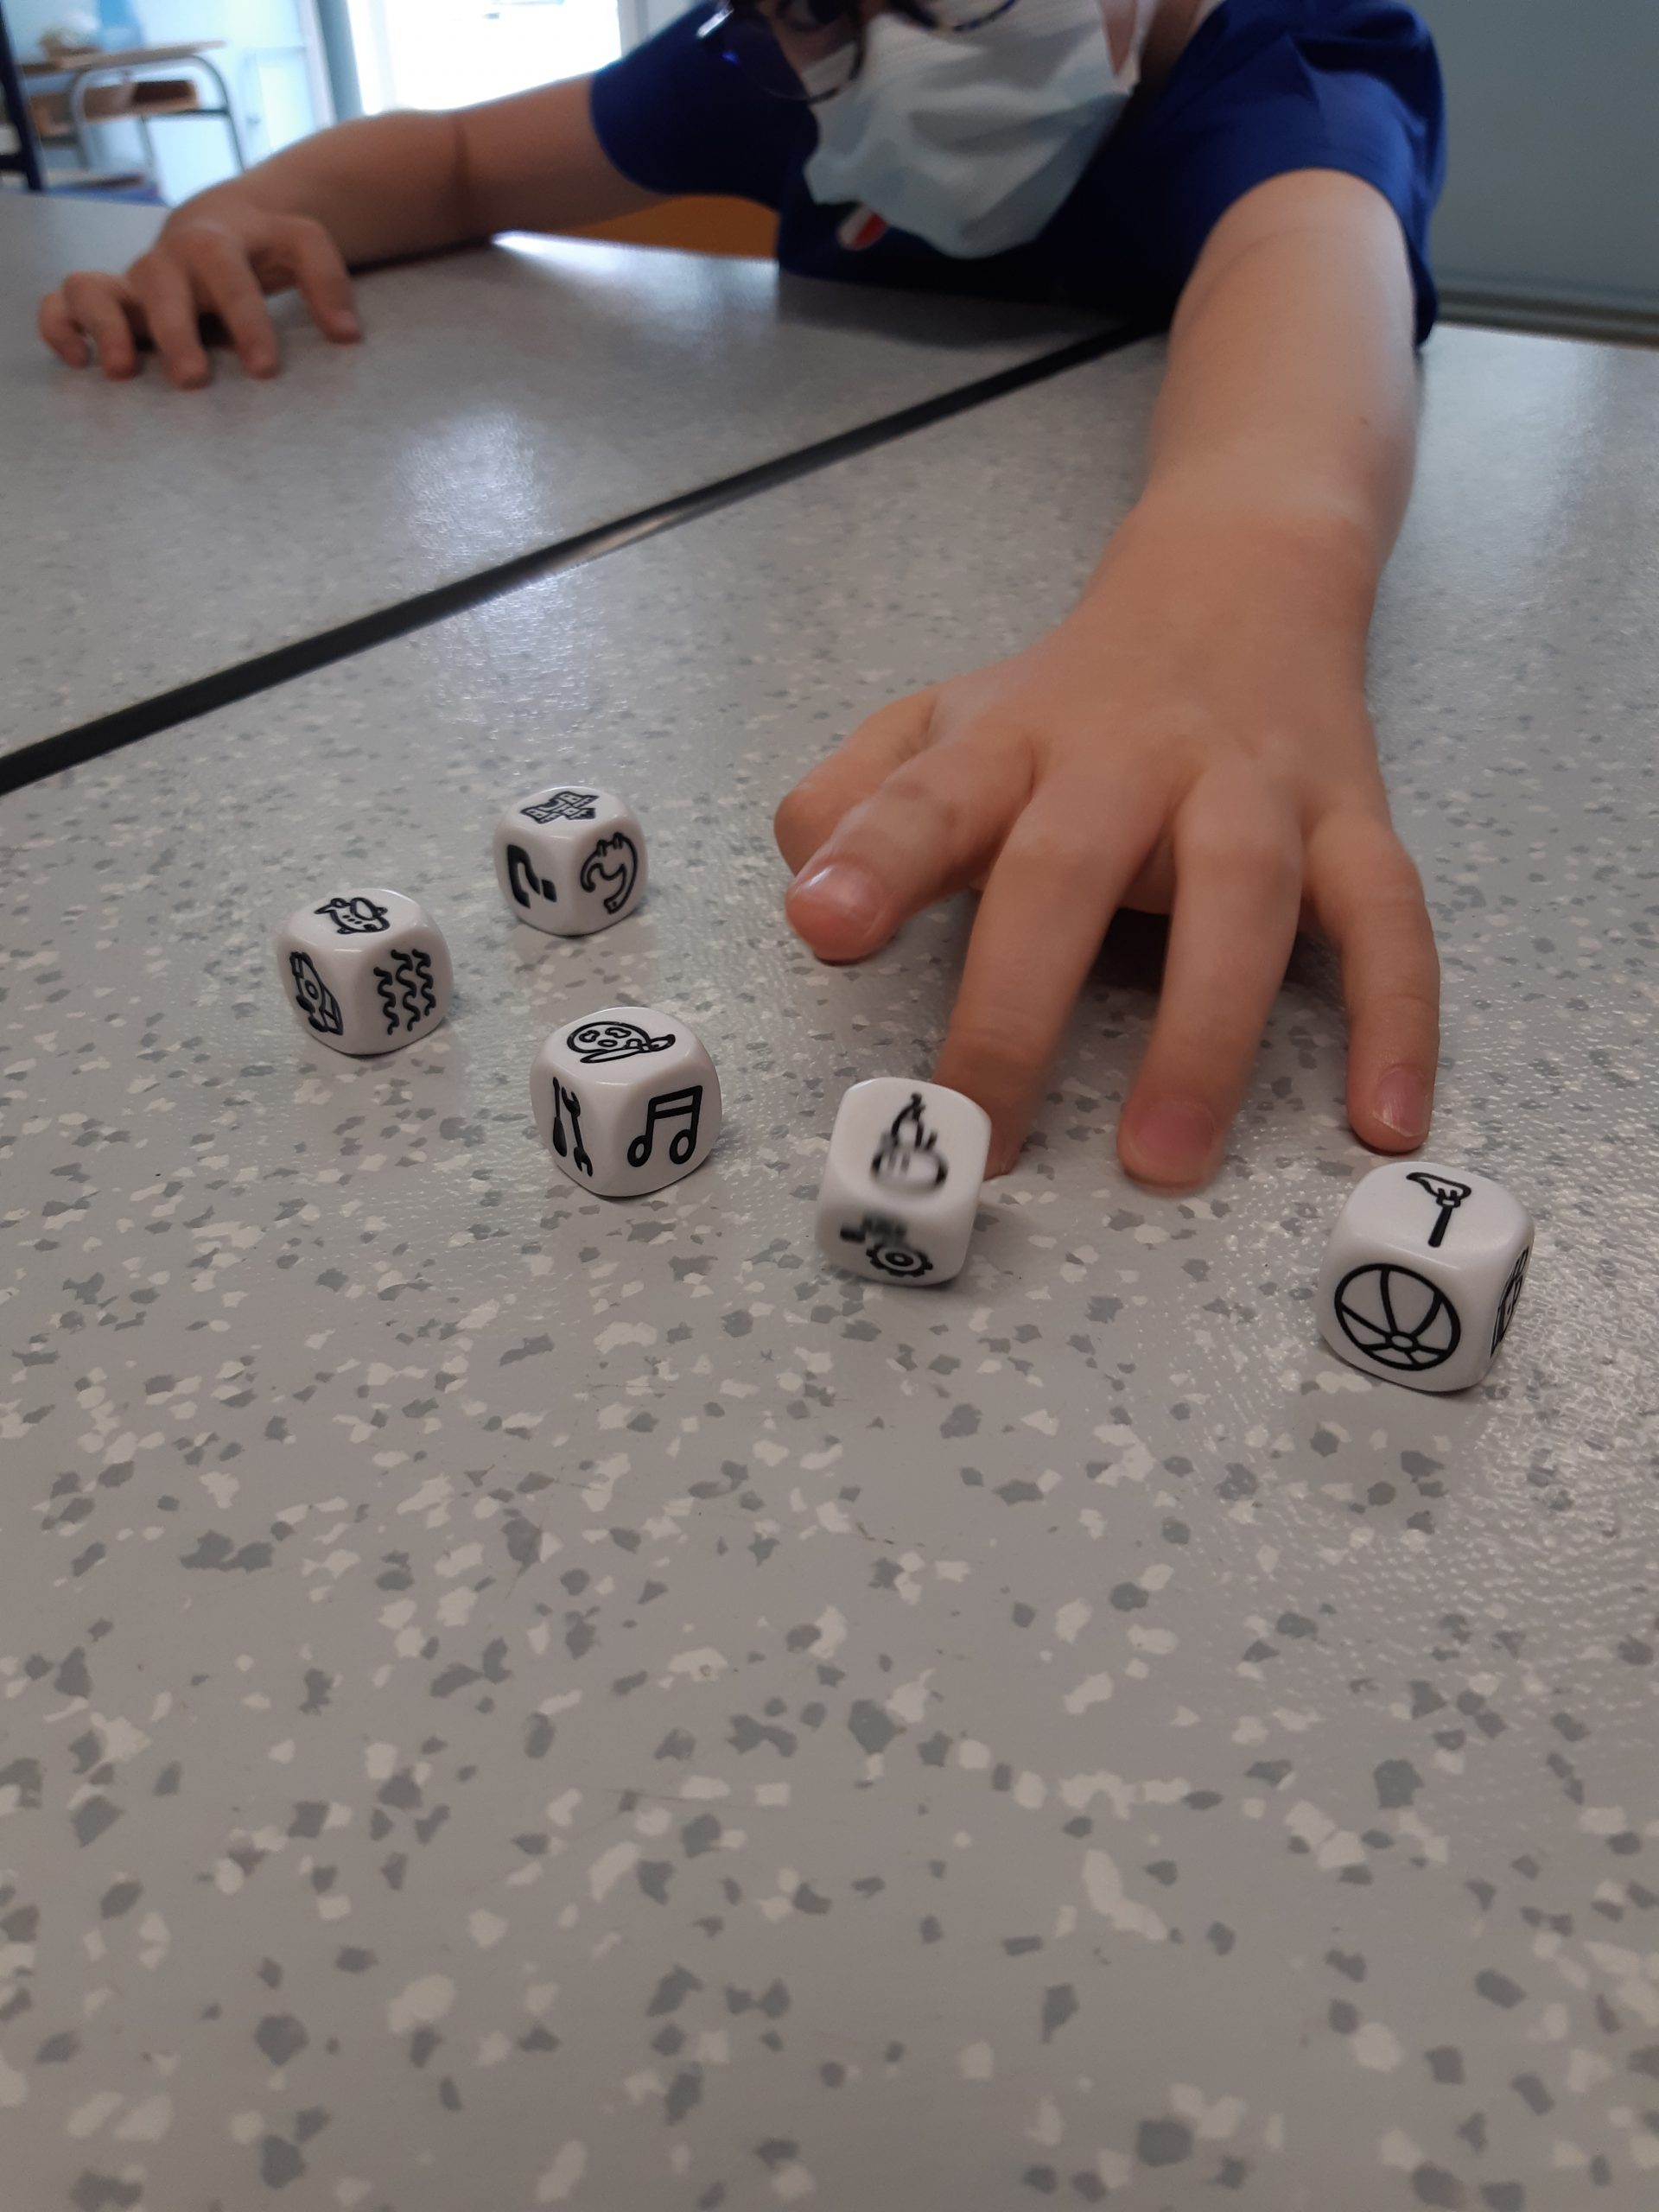 Session bibliothèque / jeu avec le jeu Imagidés